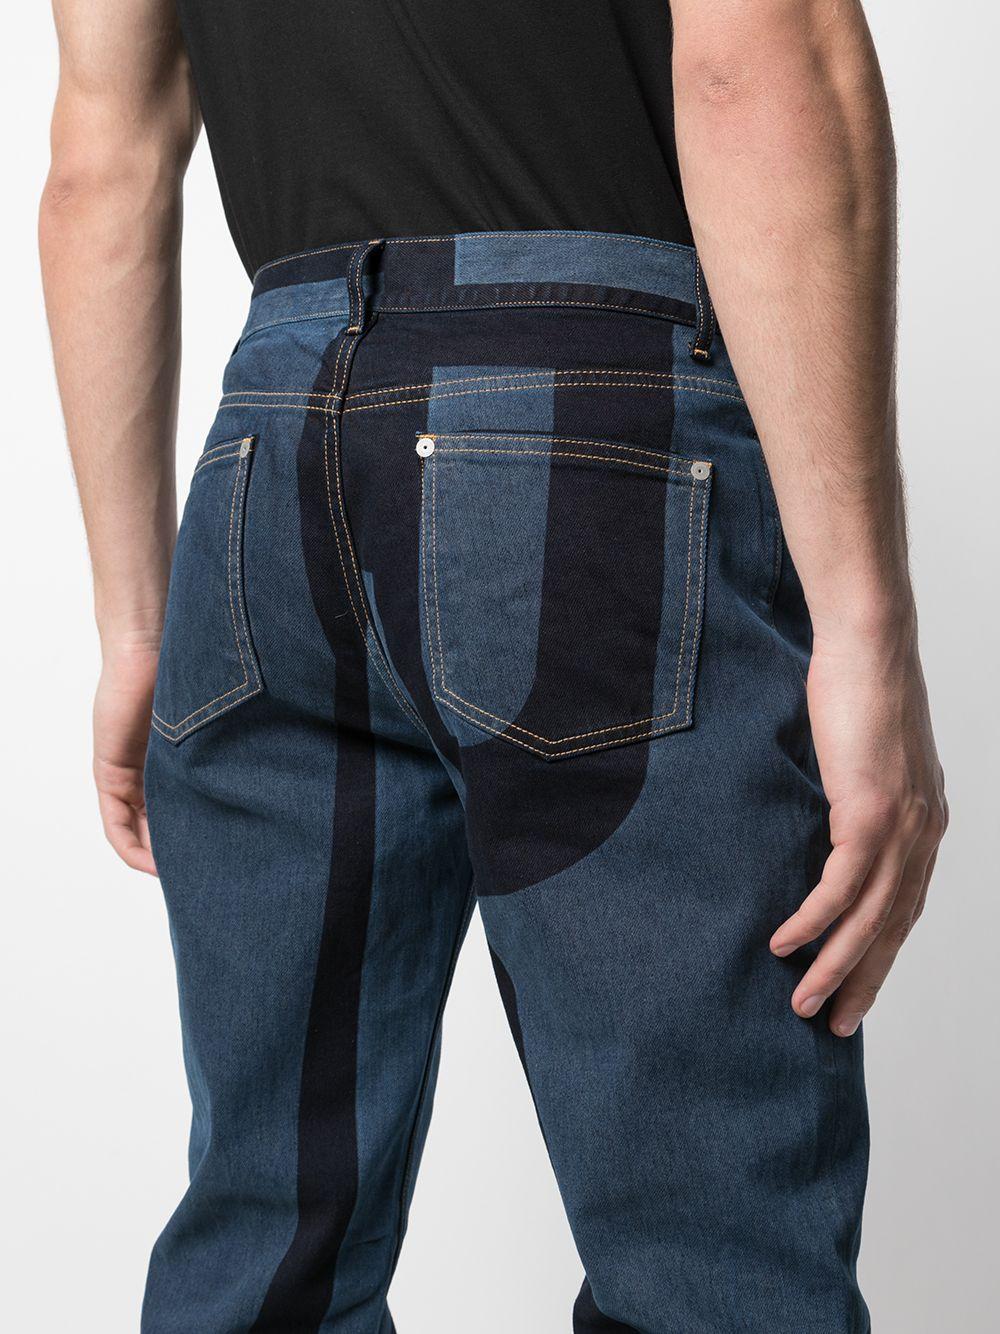 Maison Margiela | Maison Margiela джинсы кроя слим со вставками | Clouty